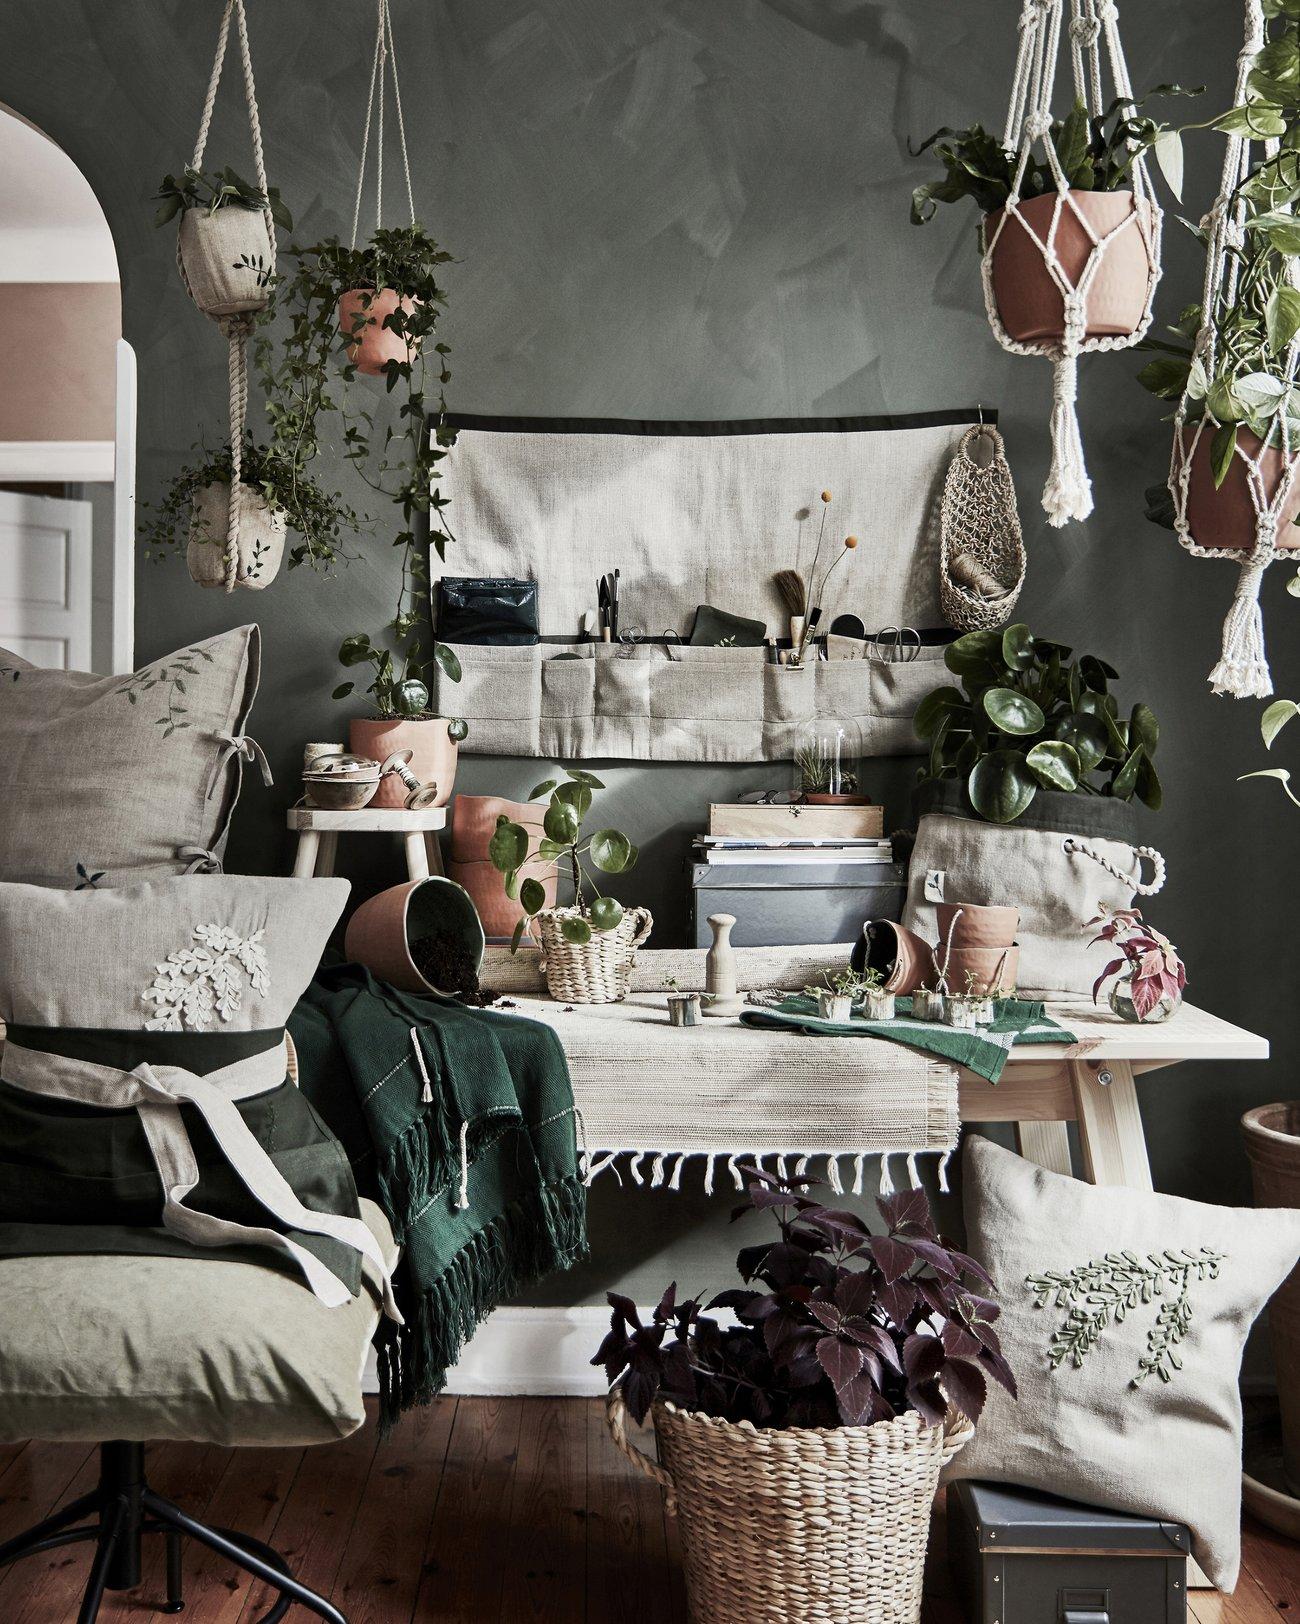 IKEA Botanisk Kollektion